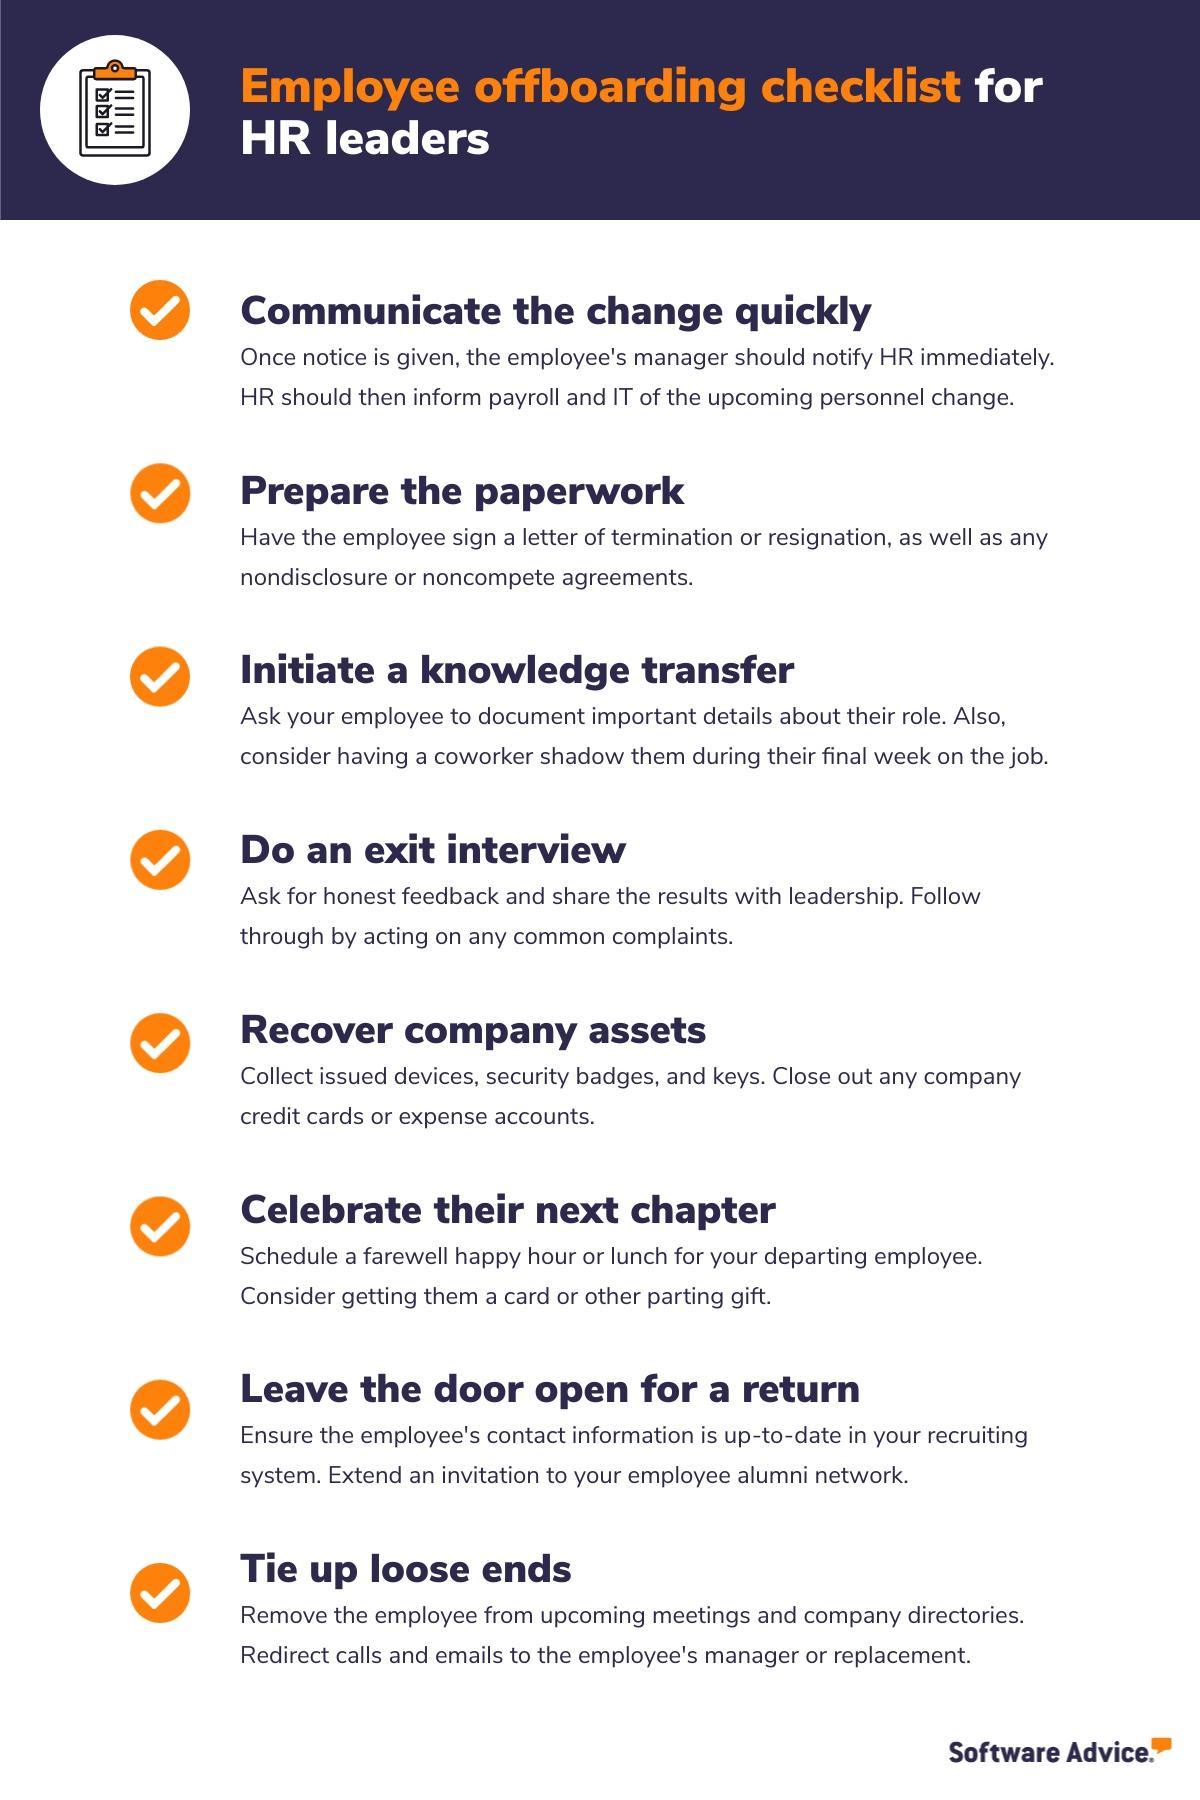 Employee offboarding checklist